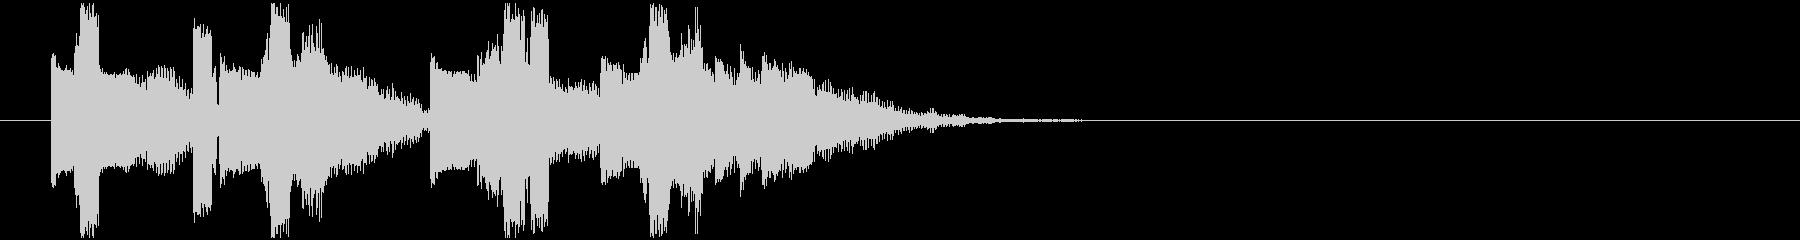 DJ効果音の未再生の波形